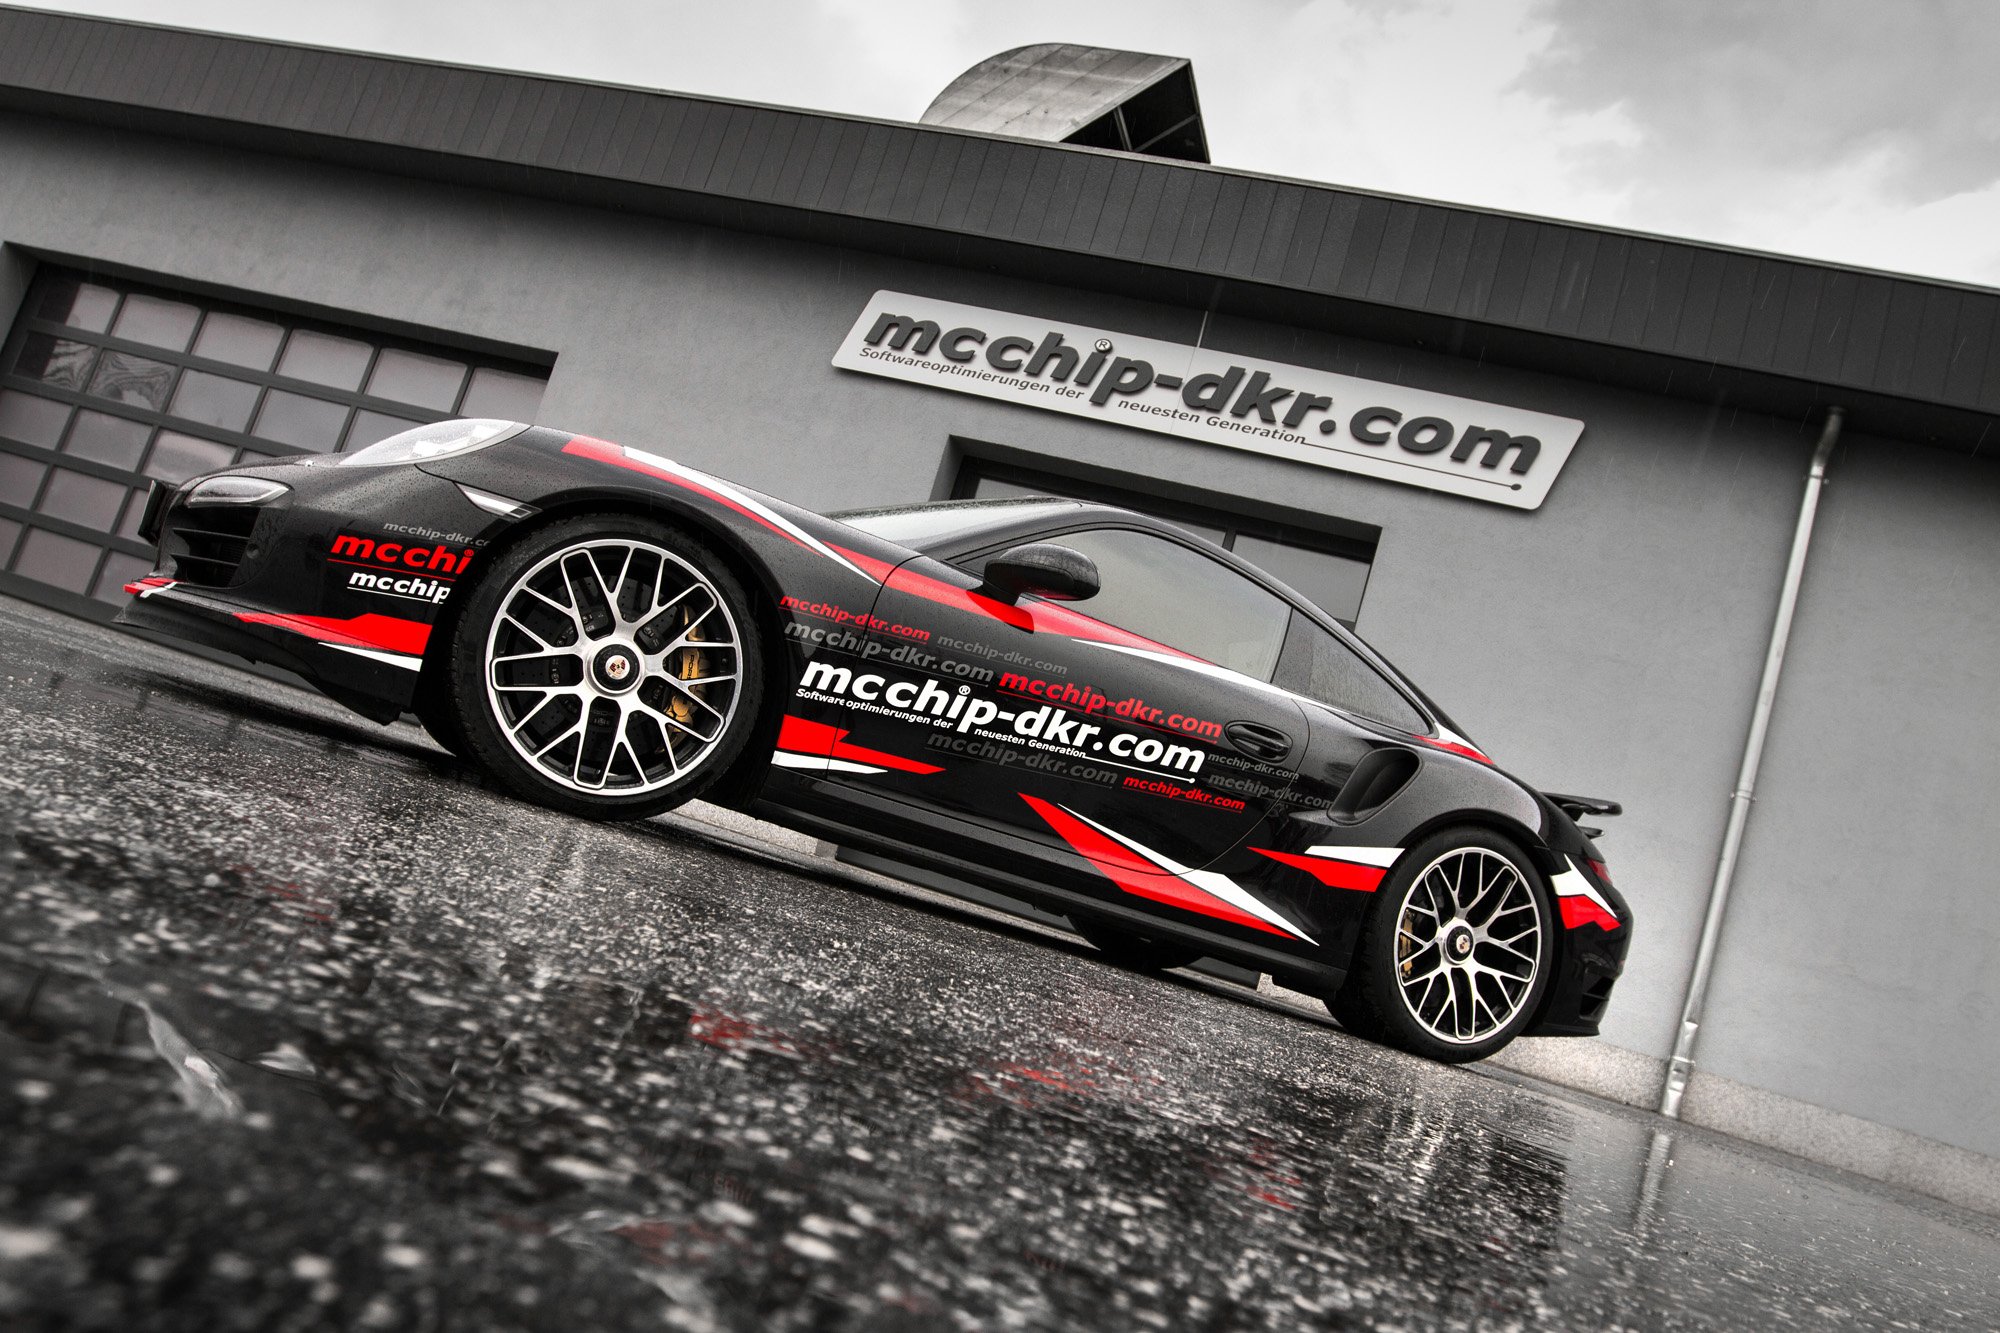 porsche-911-turbo-s-991-mcchip-dkr-07